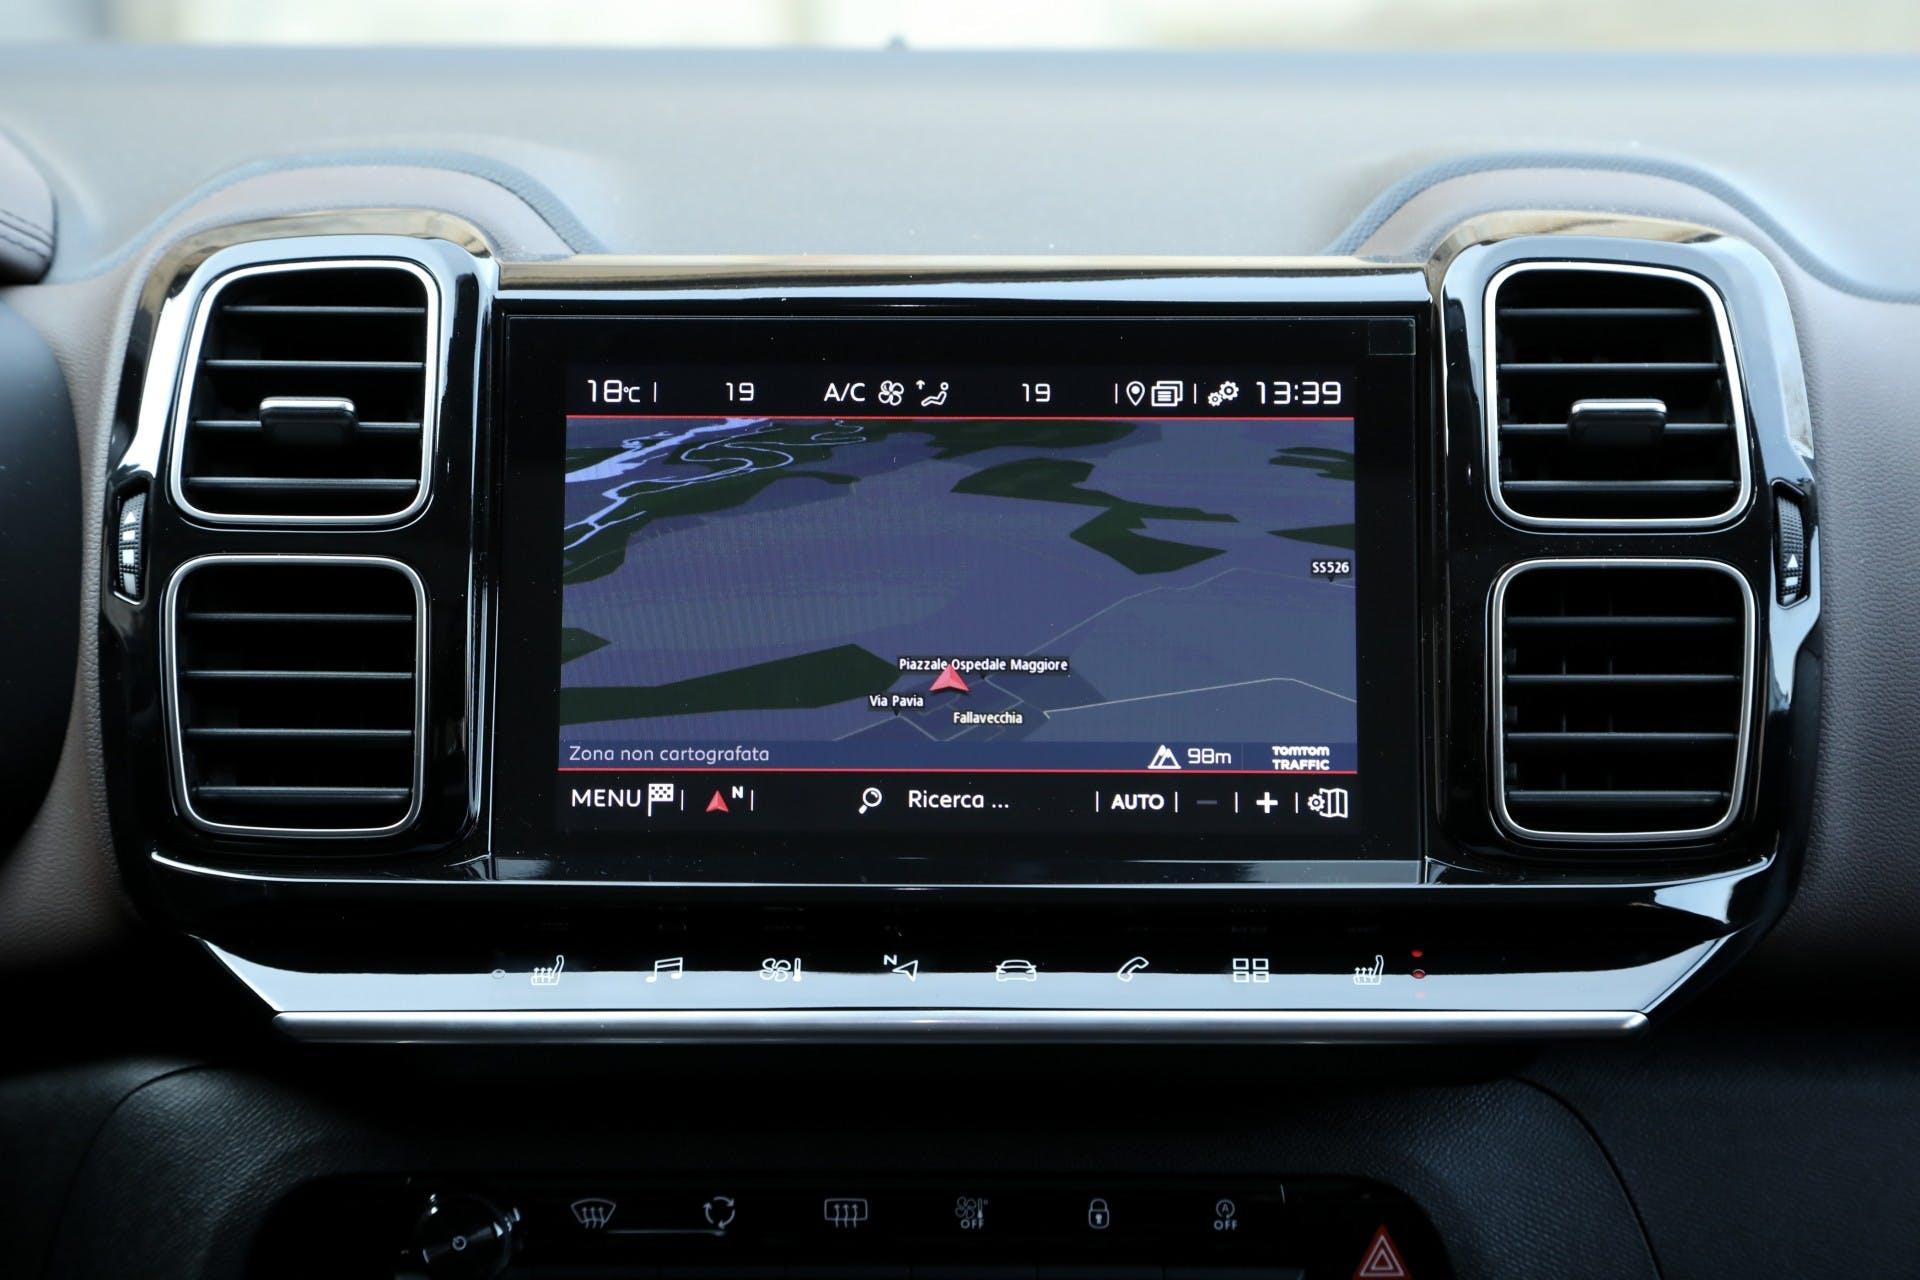 Citroen C5 Aircross 2019 auto interni display navigatore